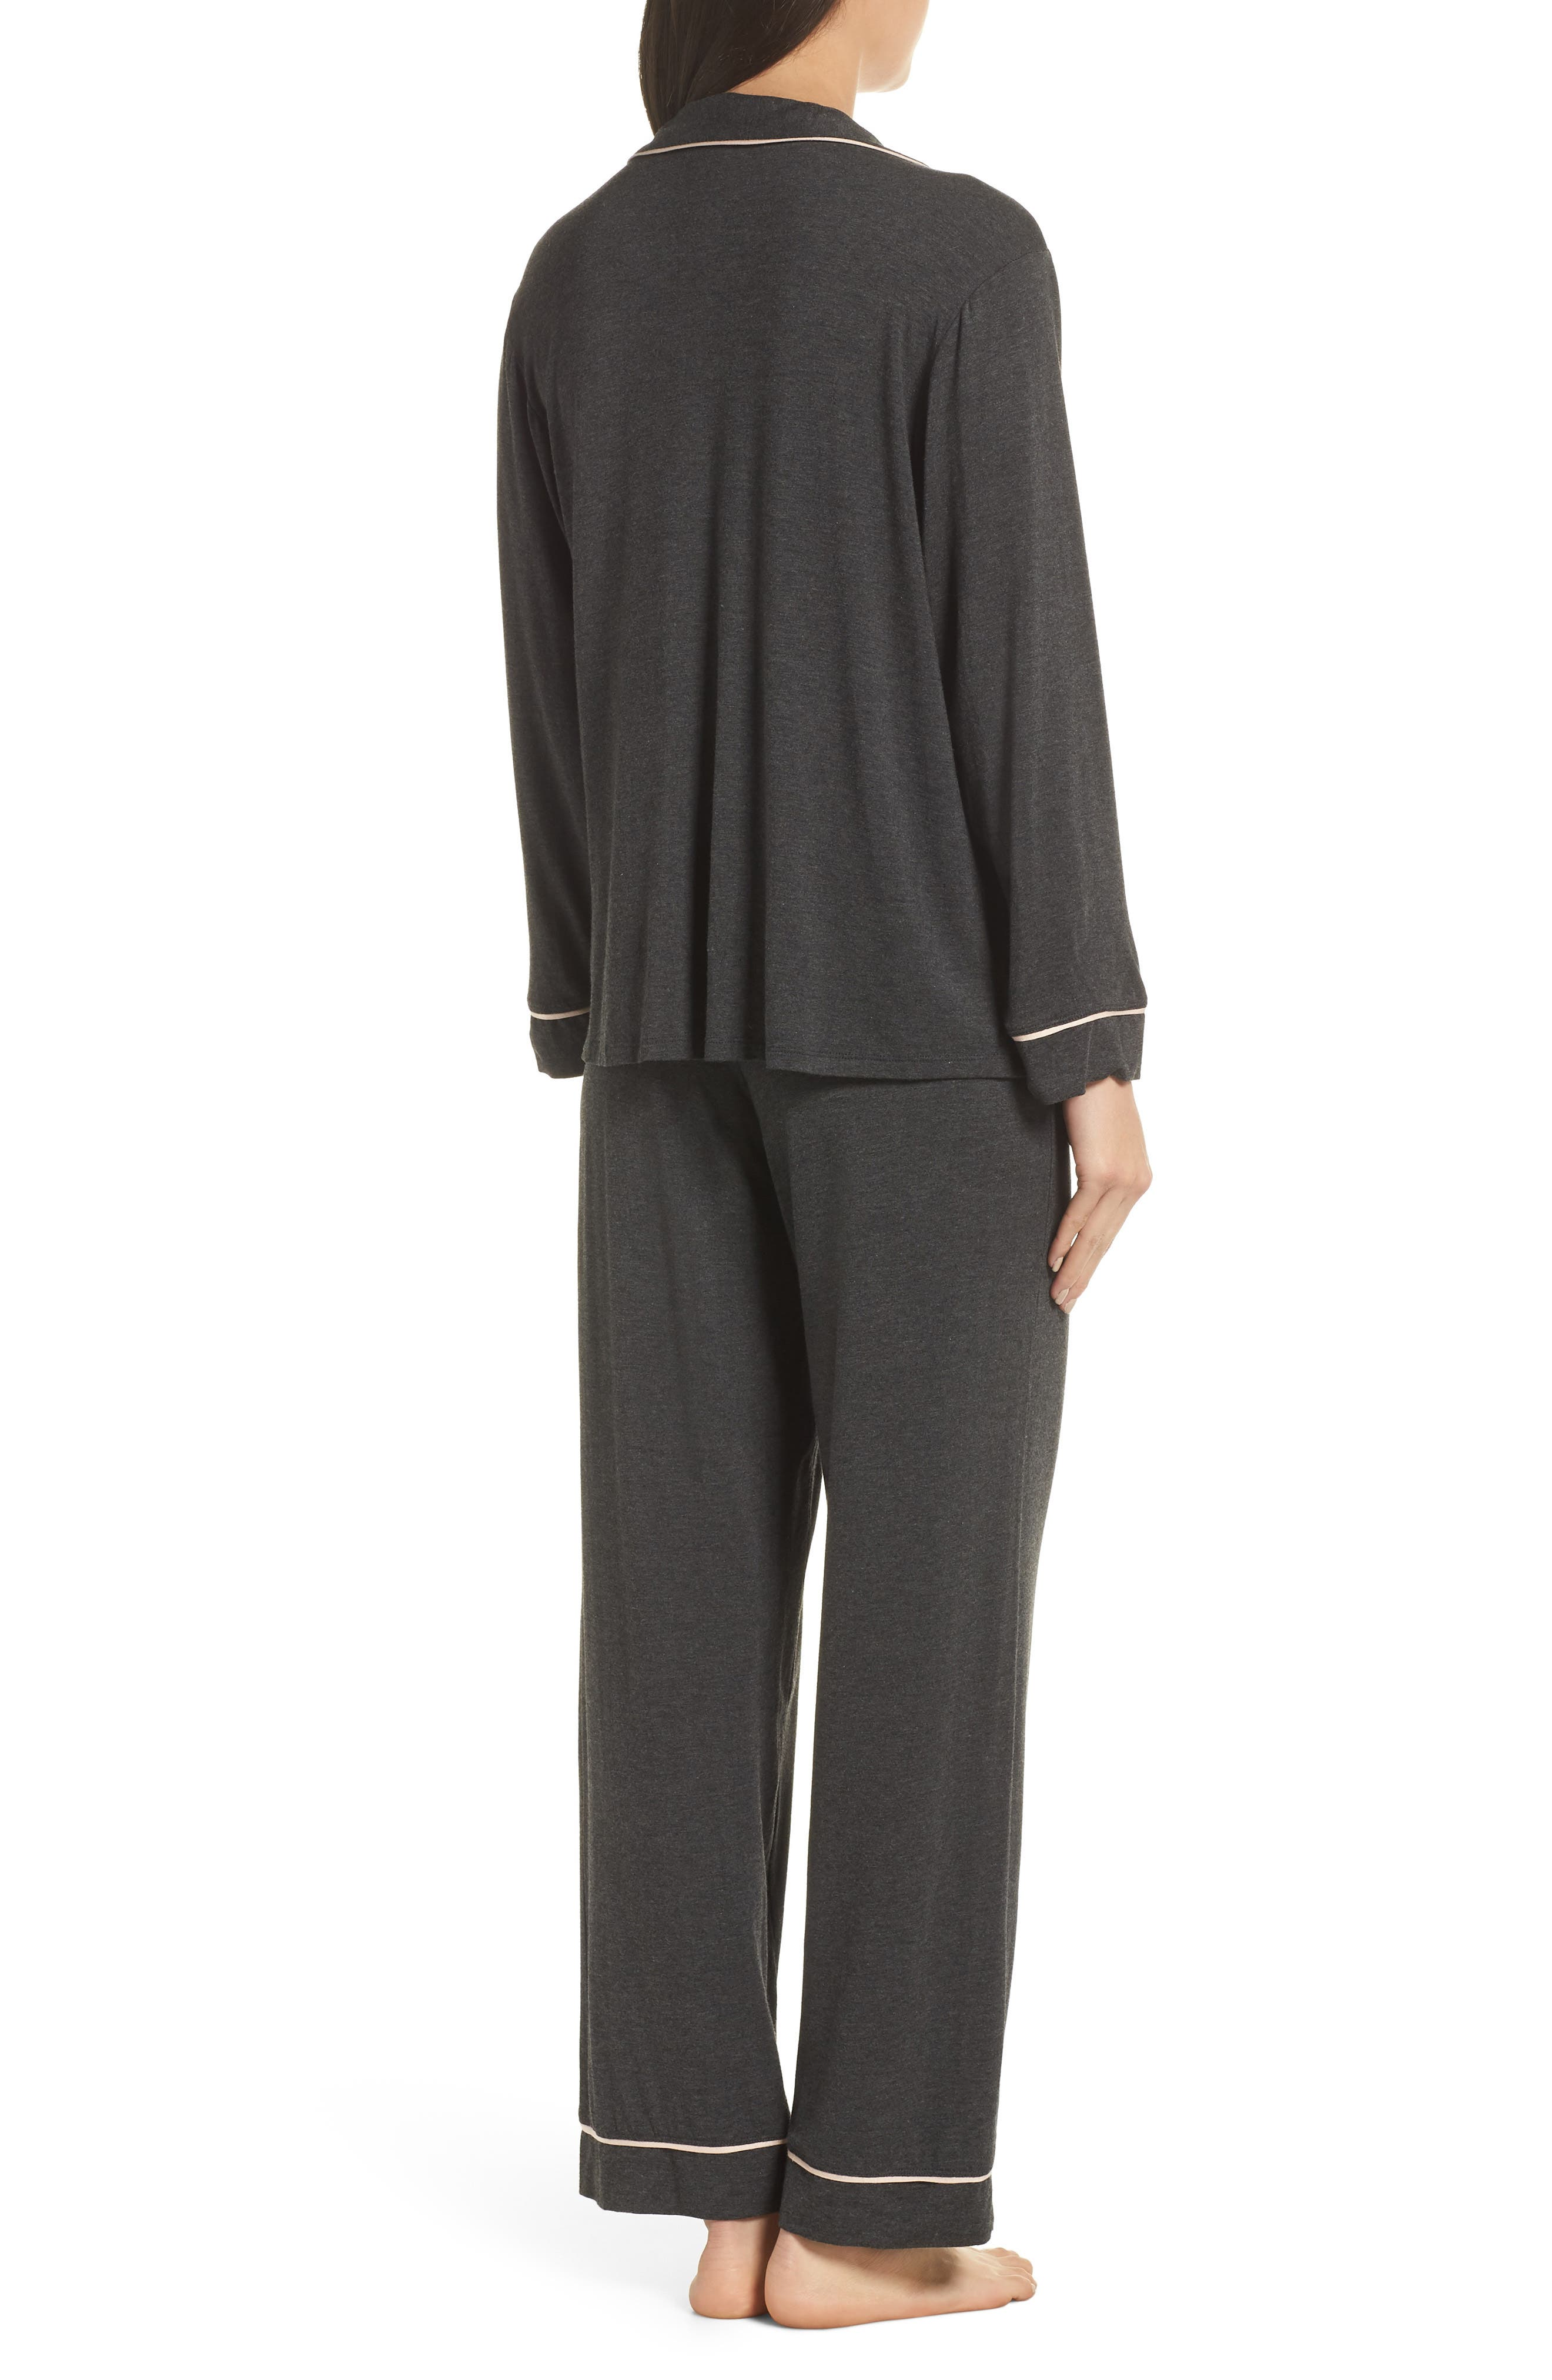 Gisele Pajamas,                             Alternate thumbnail 2, color,                             CHARCOAL/ BELLINI